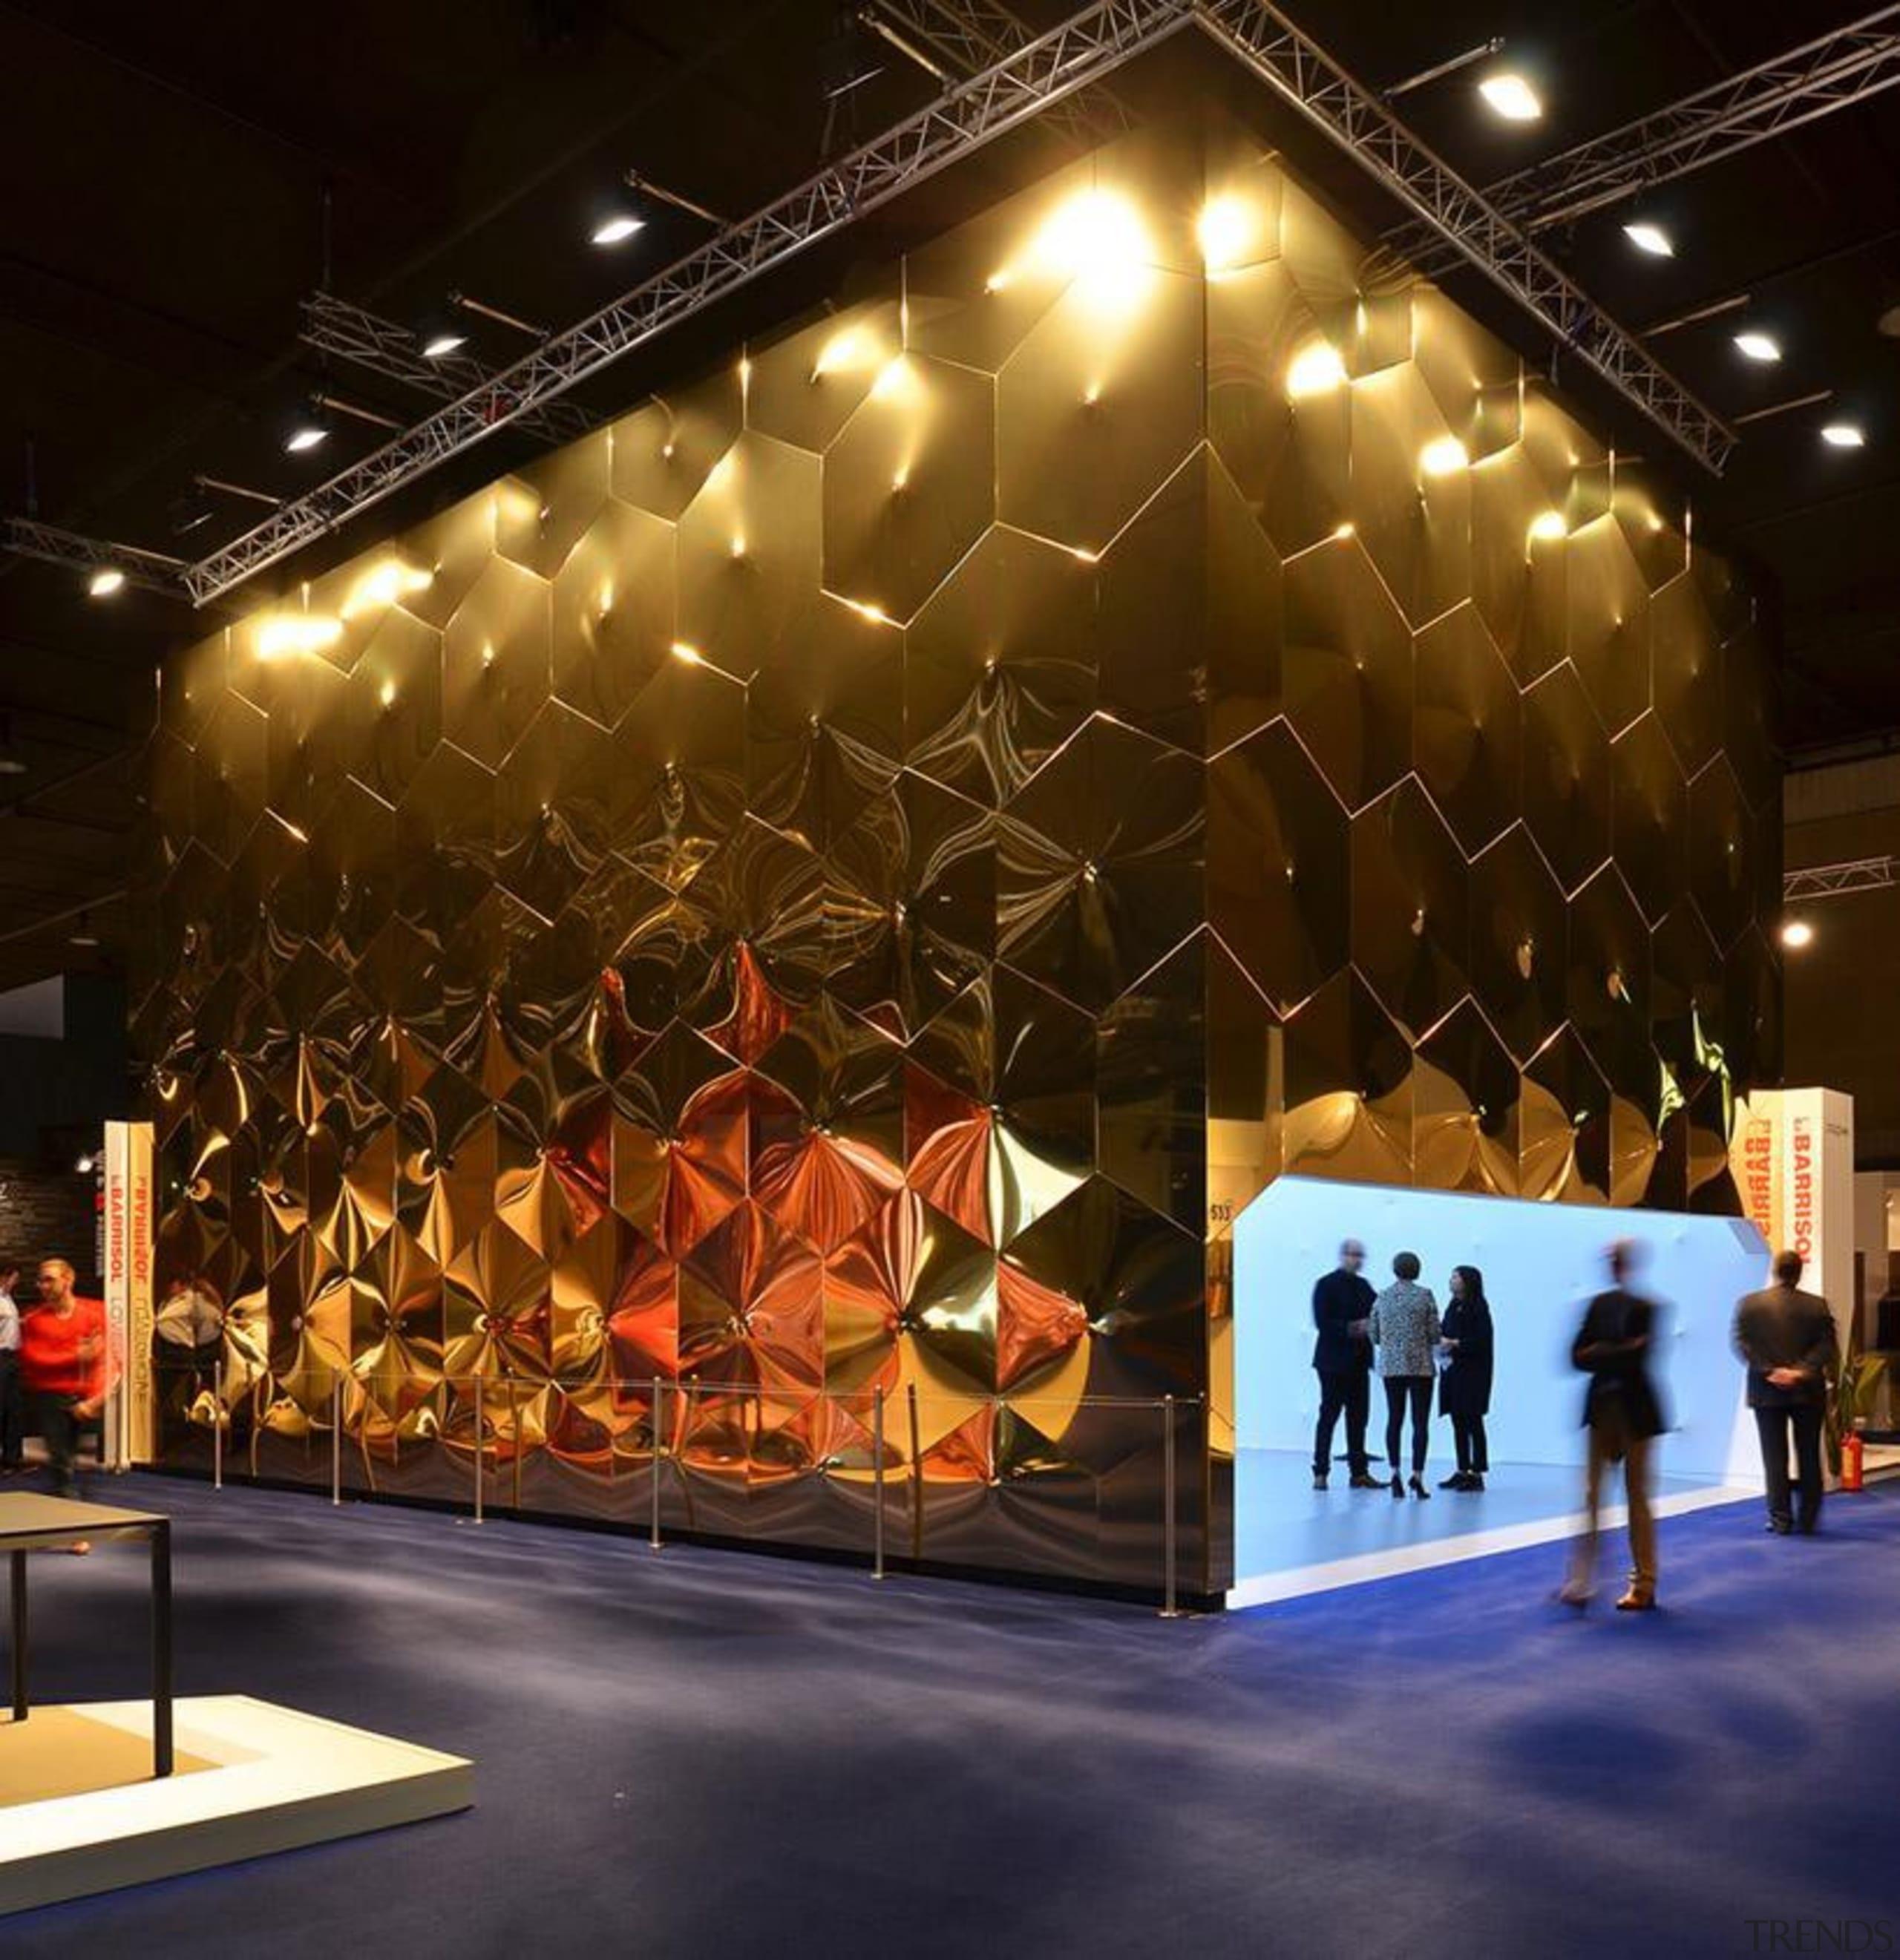 Lighting installation by Ross Lovegrove - Lighting installation design, lighting, stage, brown, black